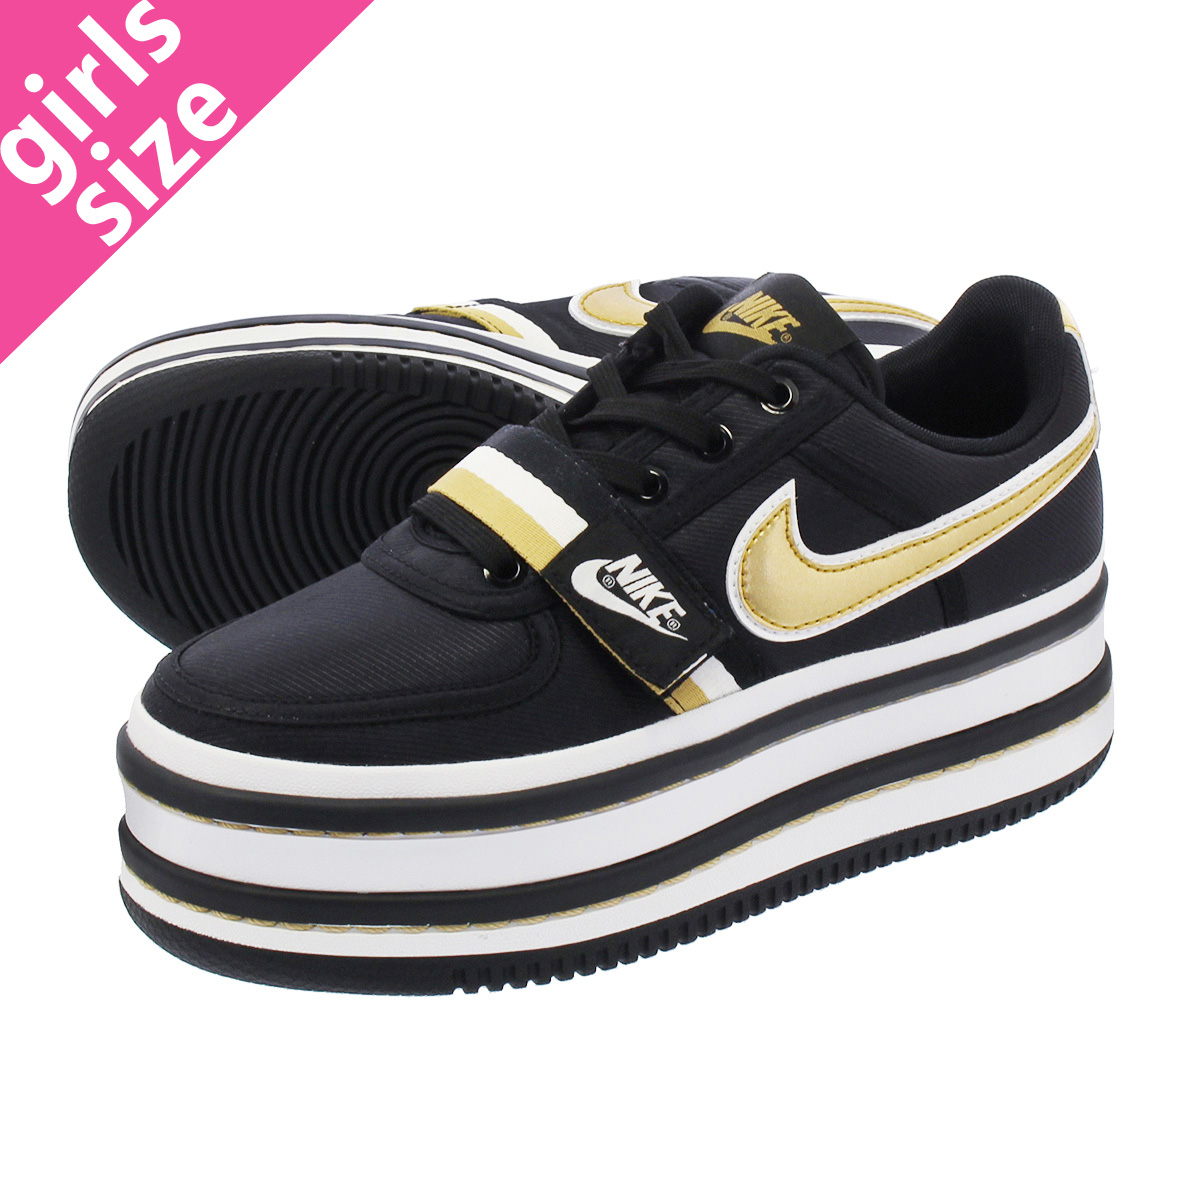 wholesale dealer 6955c ed464 LOWTEX PLUS  NIKE WMNS VANDAL 2K Nike women Vandal 2K BLACK METALLIC GOLD  ao2868-002-l   Rakuten Global Market